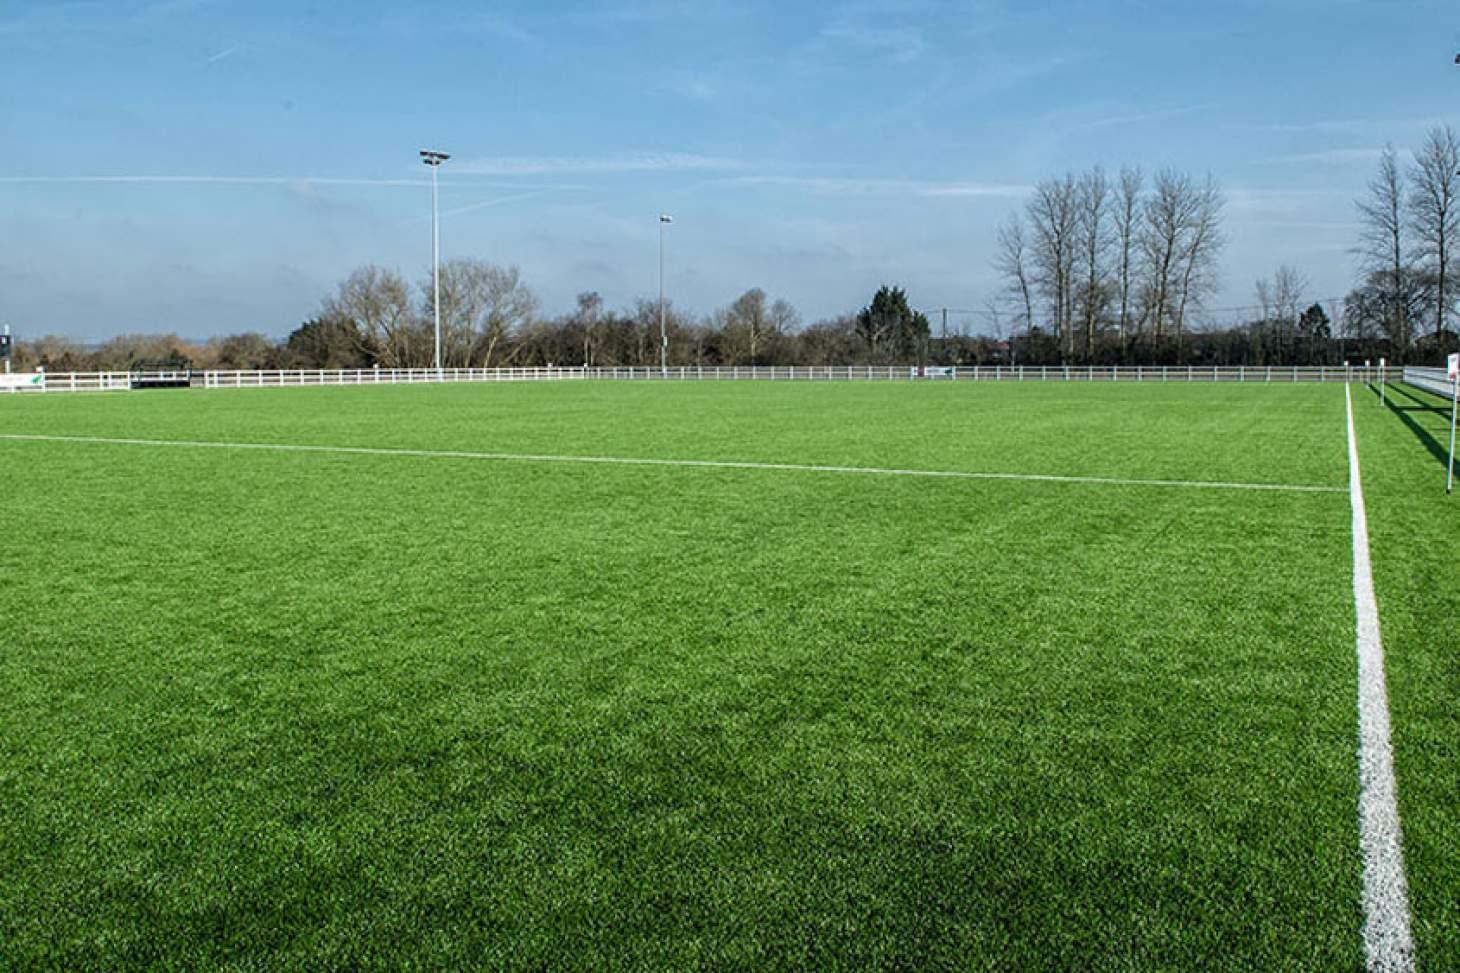 PlayFootball Middlesbrough Billingham 8 a side | 3G Astroturf football pitch